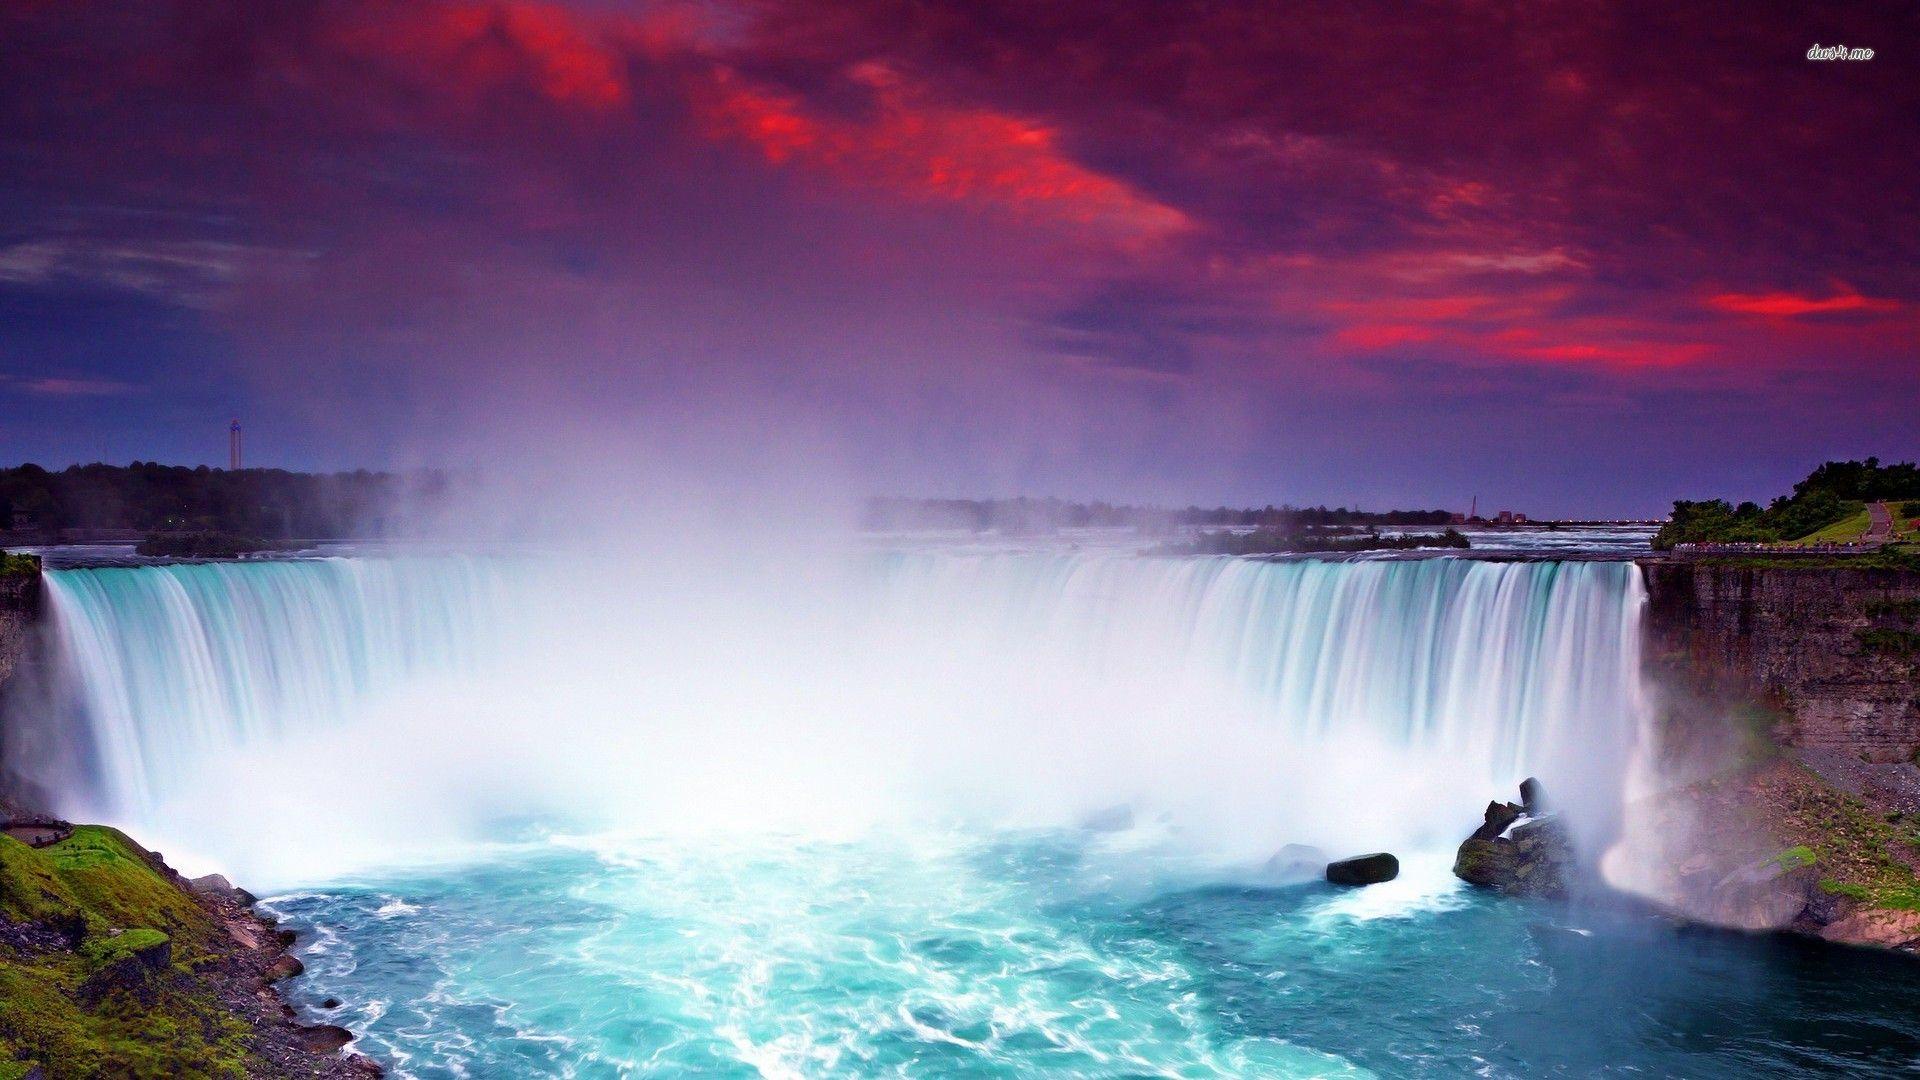 Niagara Falls Wallpaper Hd Hd Wallpapers High Definition